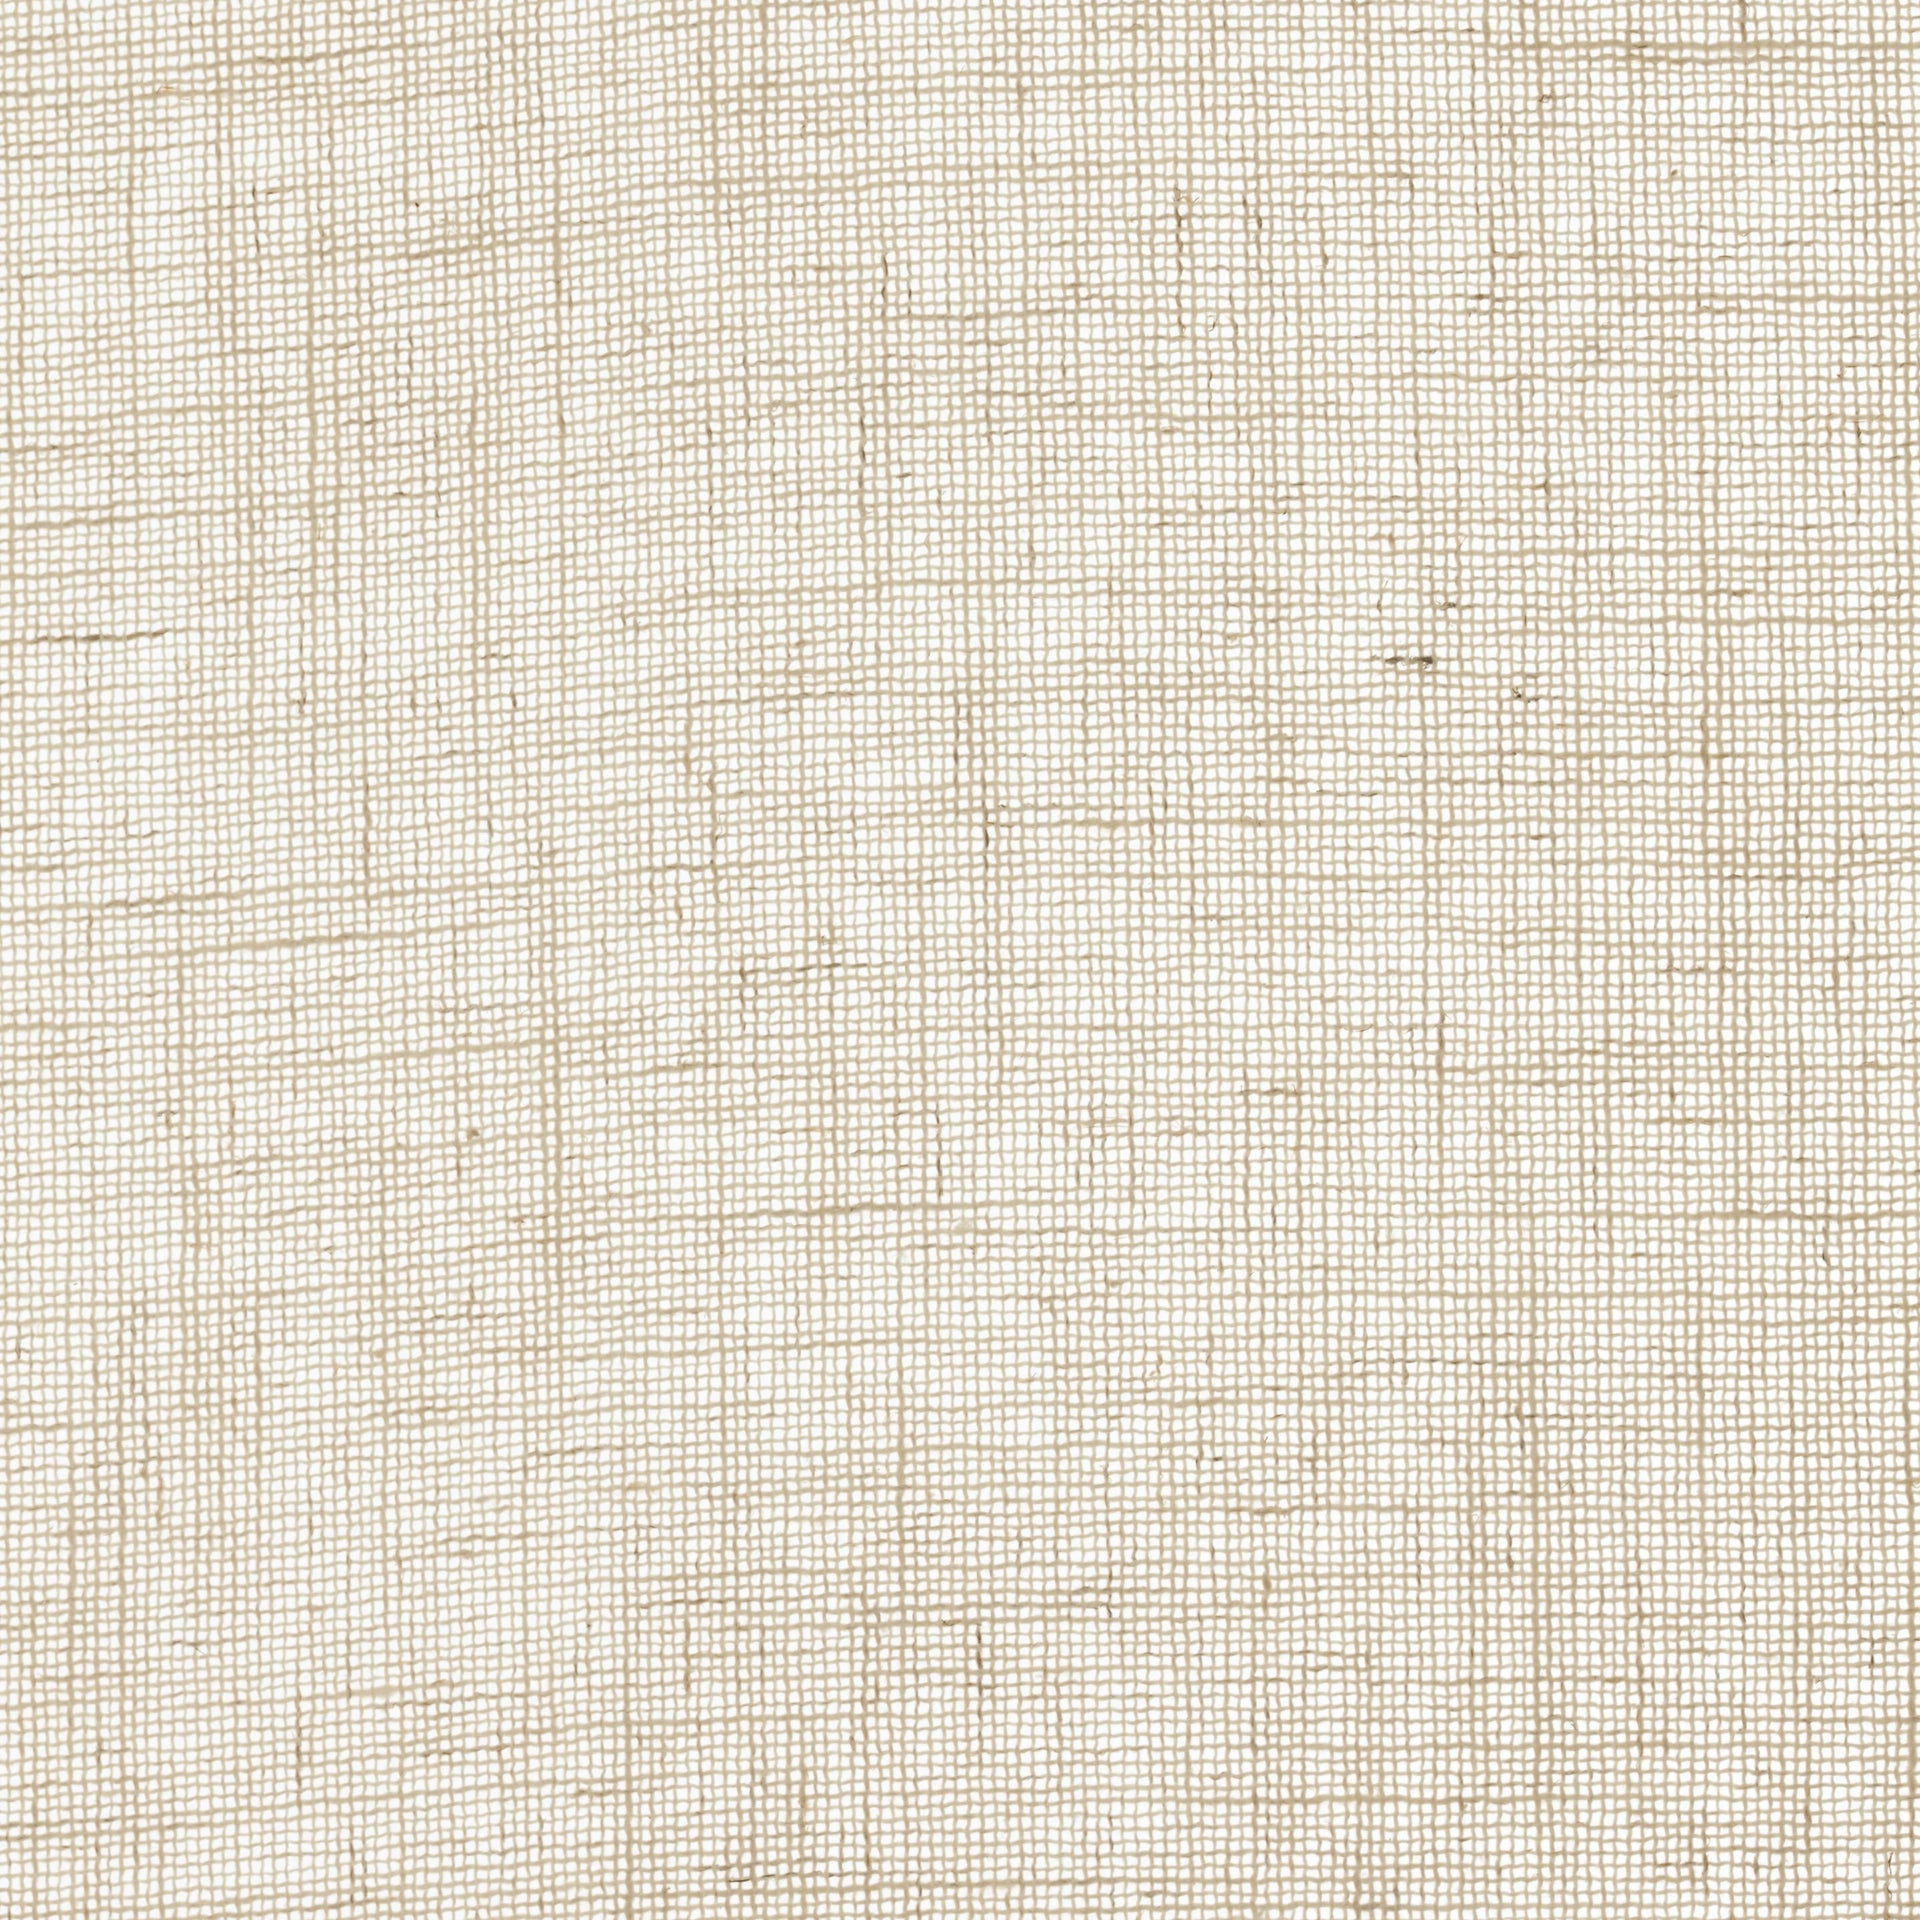 Tenda INSPIRE Charlina beige occhielli 140 x 280 cm - 8